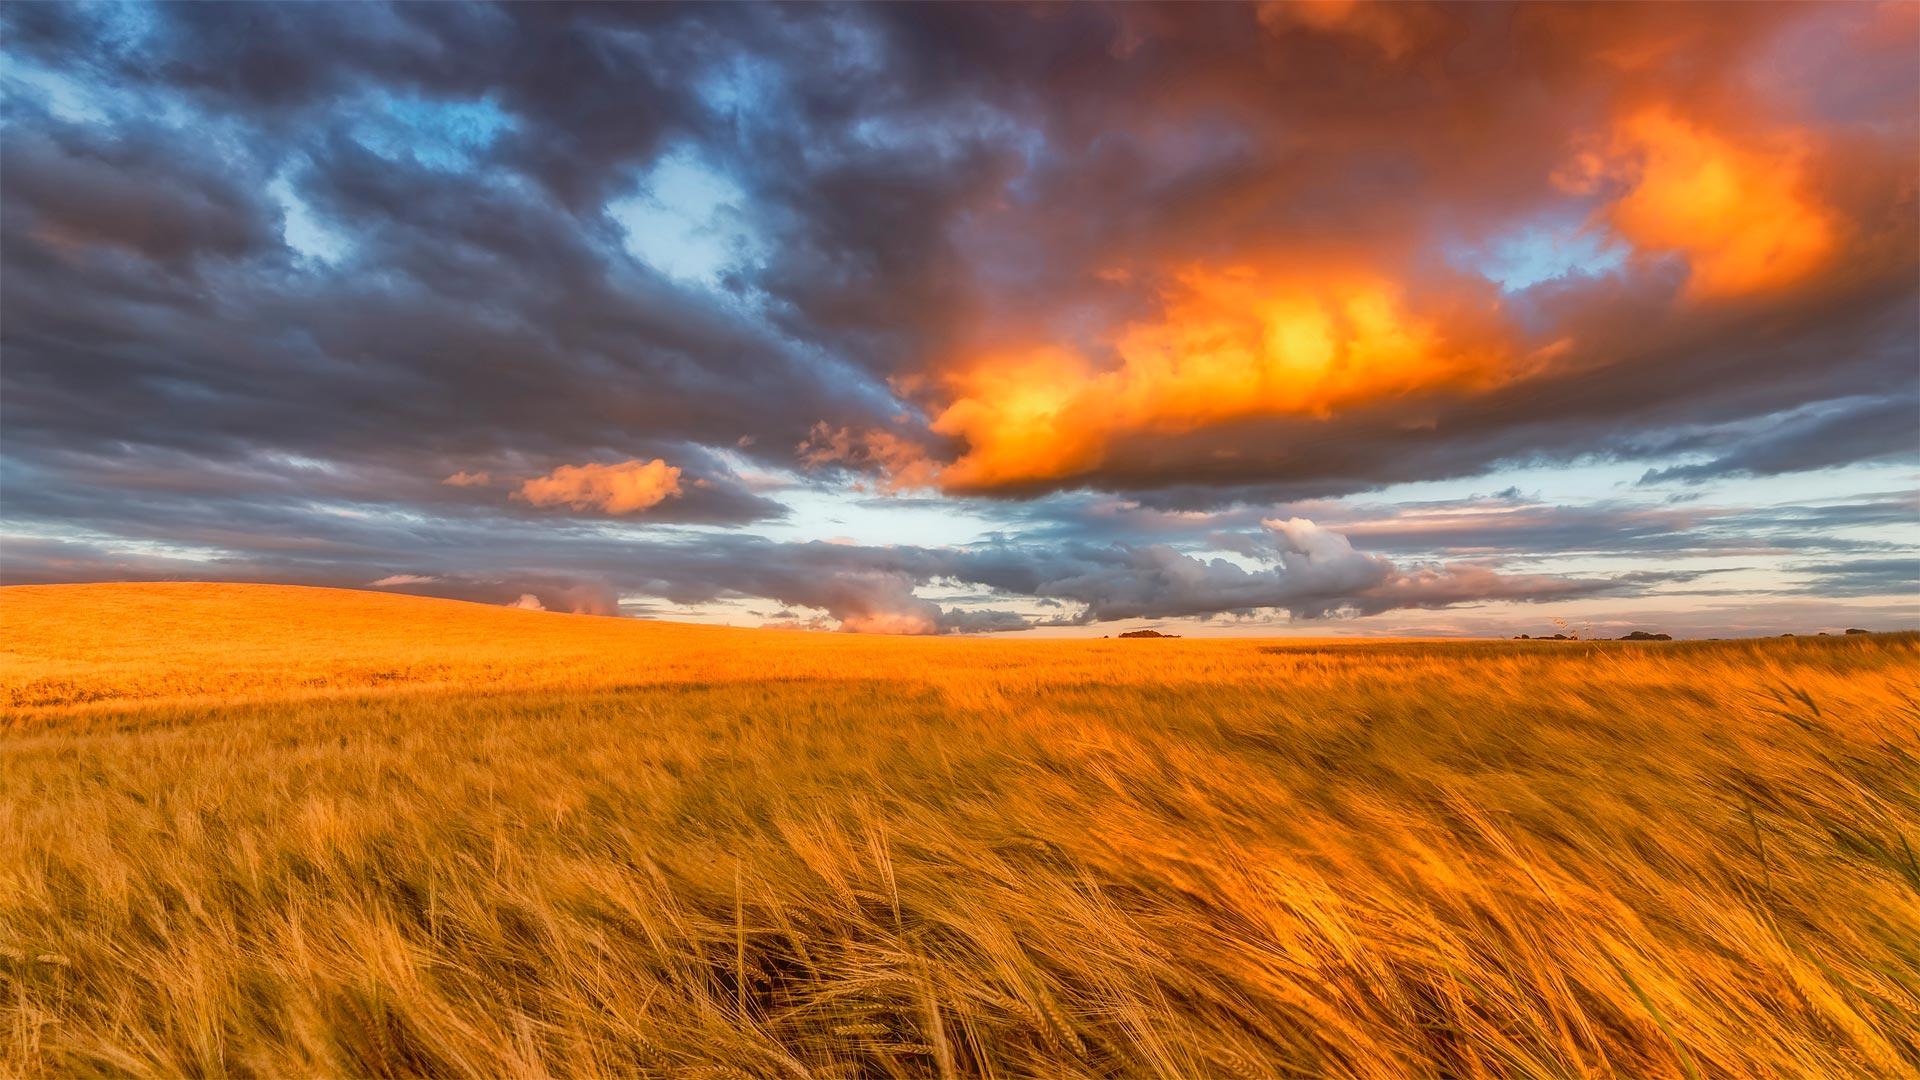 Barley field in East Lothian, Scotland (© Scott Masterton/plainpicture)(Bing United States)